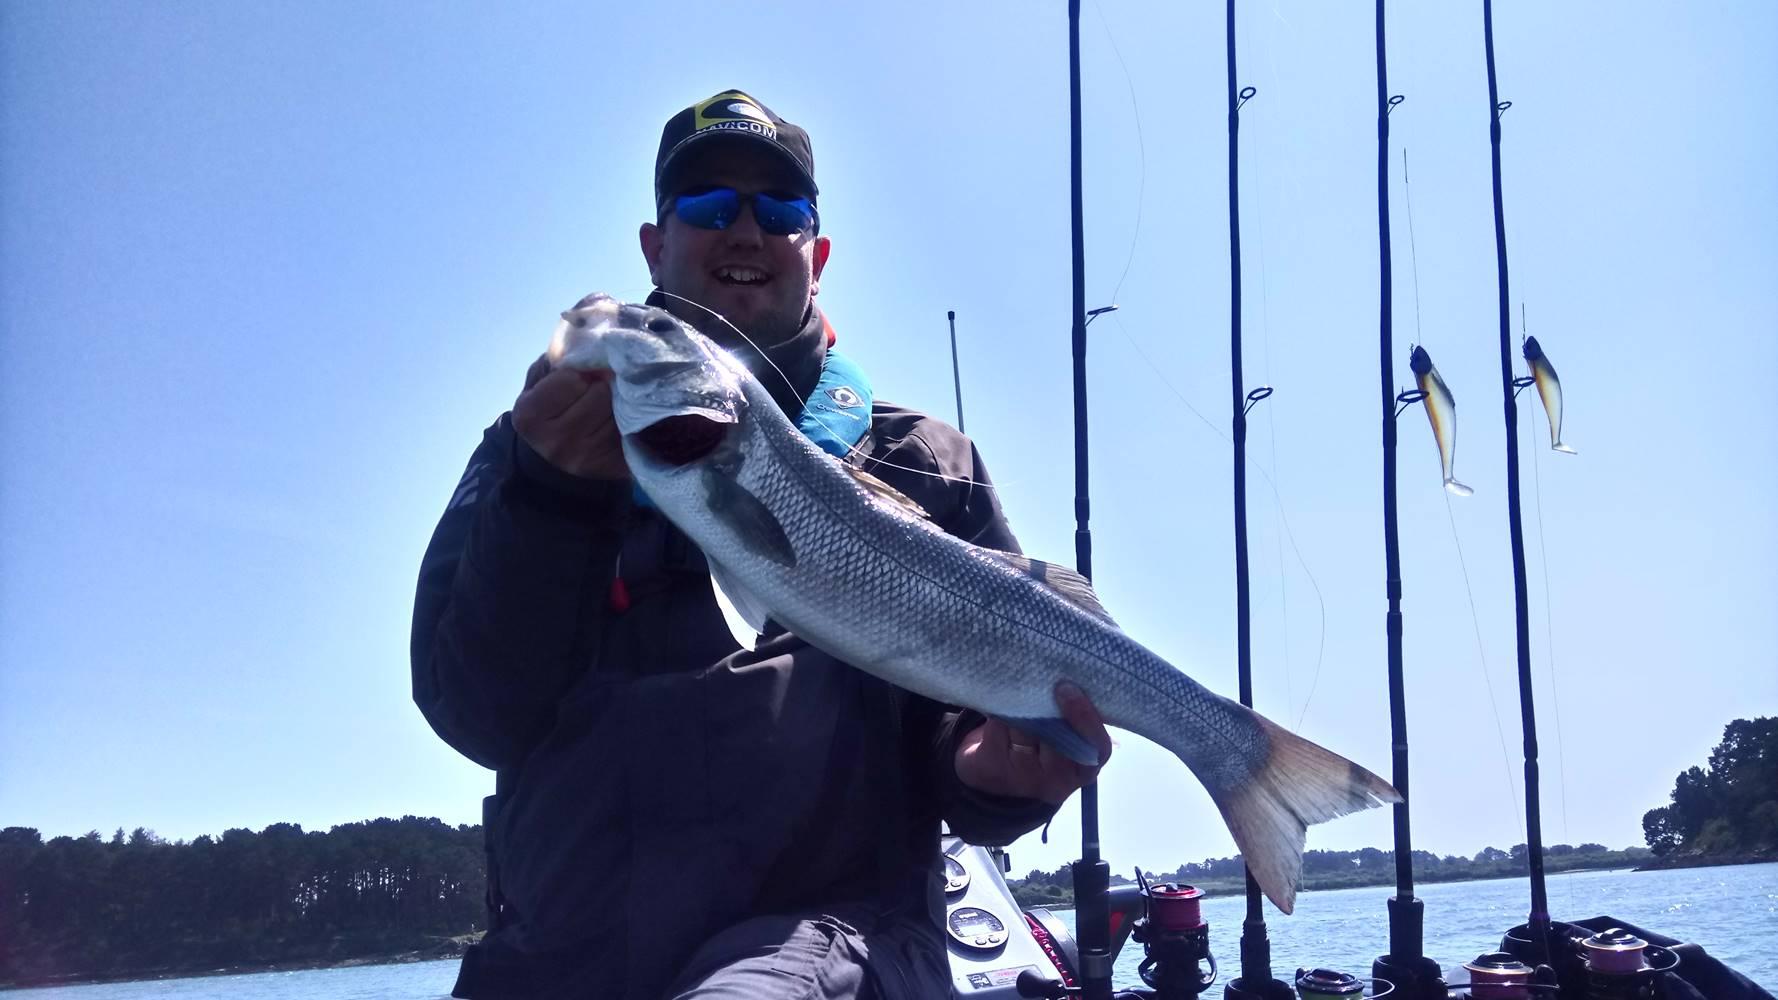 Sortie pêche dans le Golfe du Morbihan-  Guide de pêche en mer- Bar - dorade royale ©